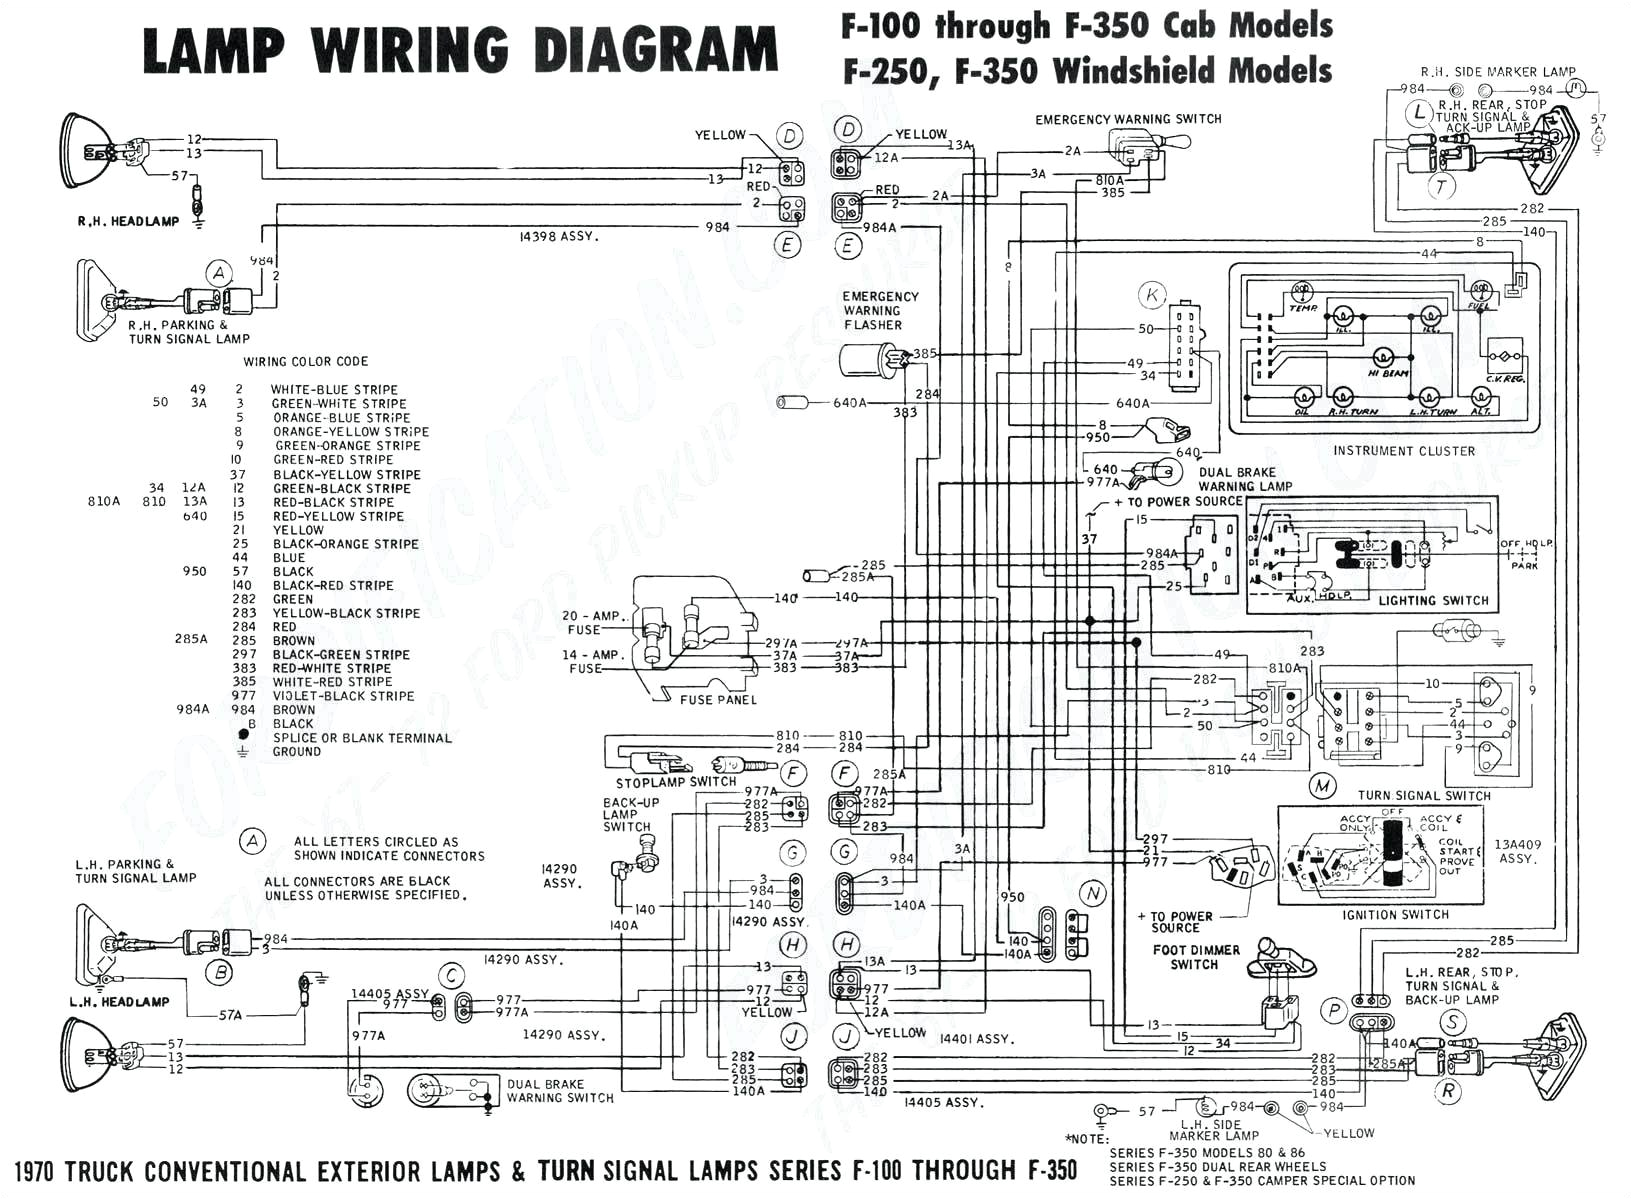 Skoda Fabia Wiring Diagram Pdf Download Diagram Circuit Icons Schematic Oyving Wiring Diagram